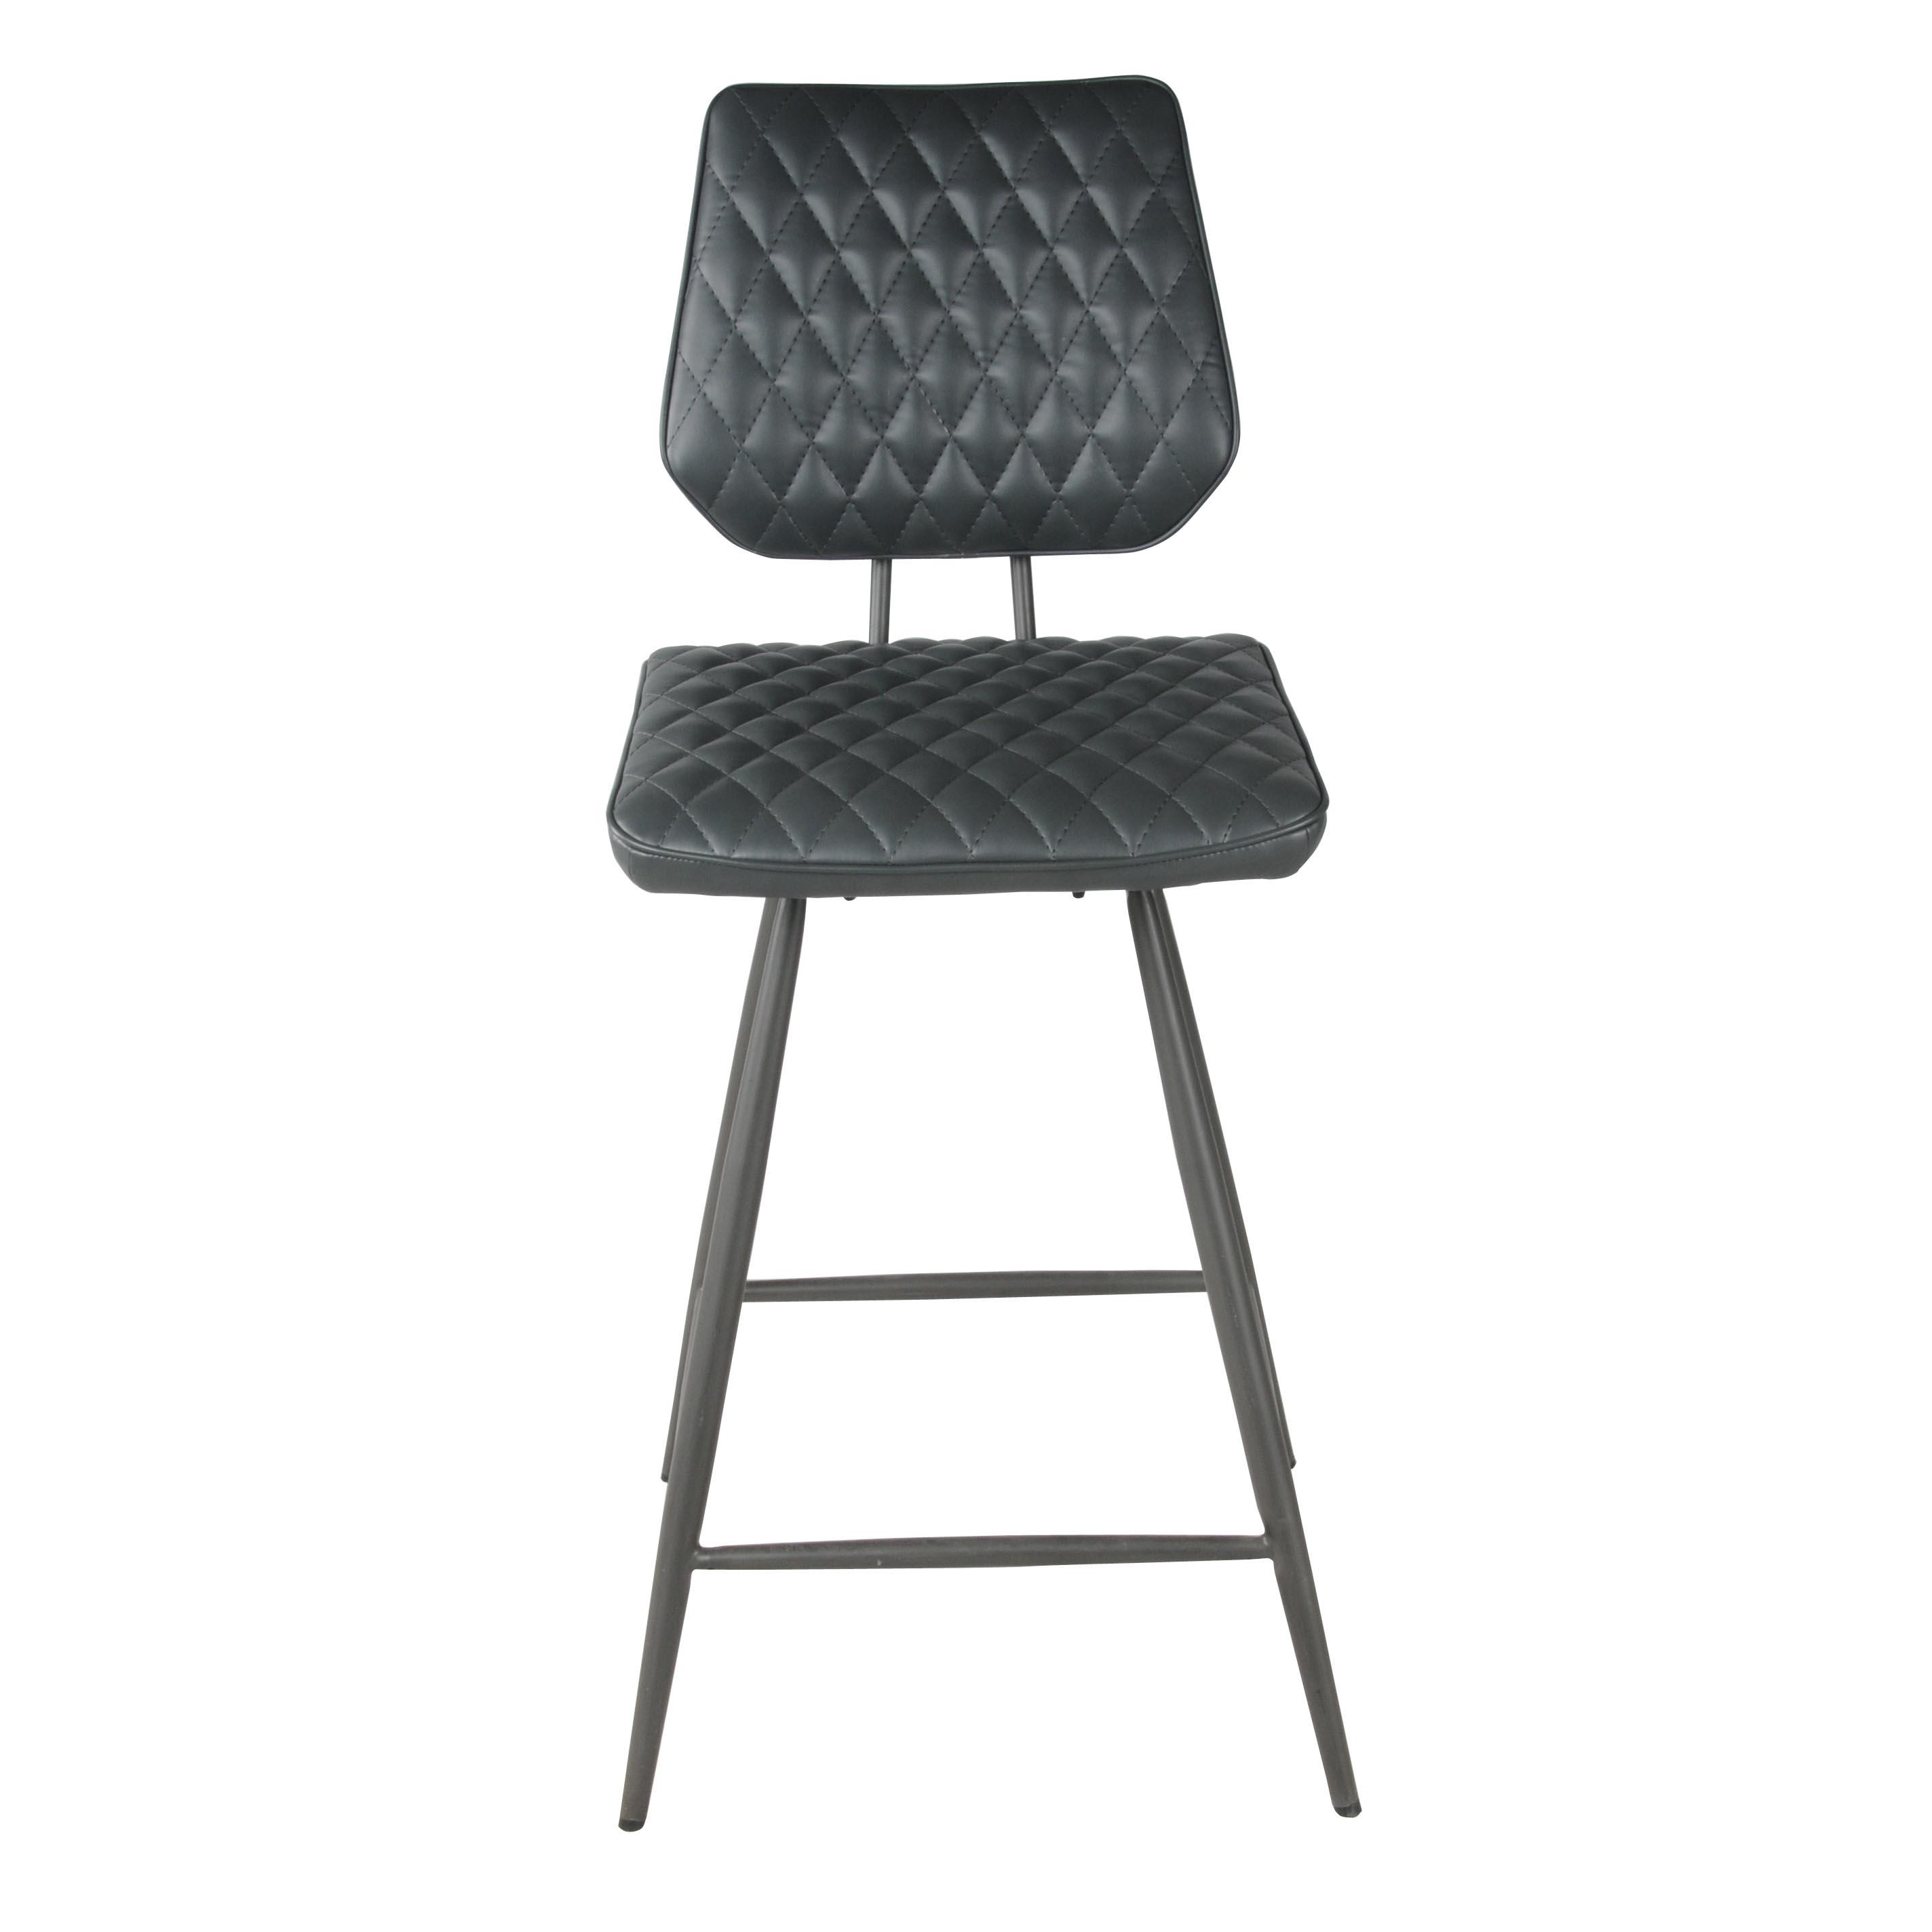 Astonishing Mitchell Kd Pu Swivel Counter Stool Vintage Black Legs Anchor Gray Lamtechconsult Wood Chair Design Ideas Lamtechconsultcom